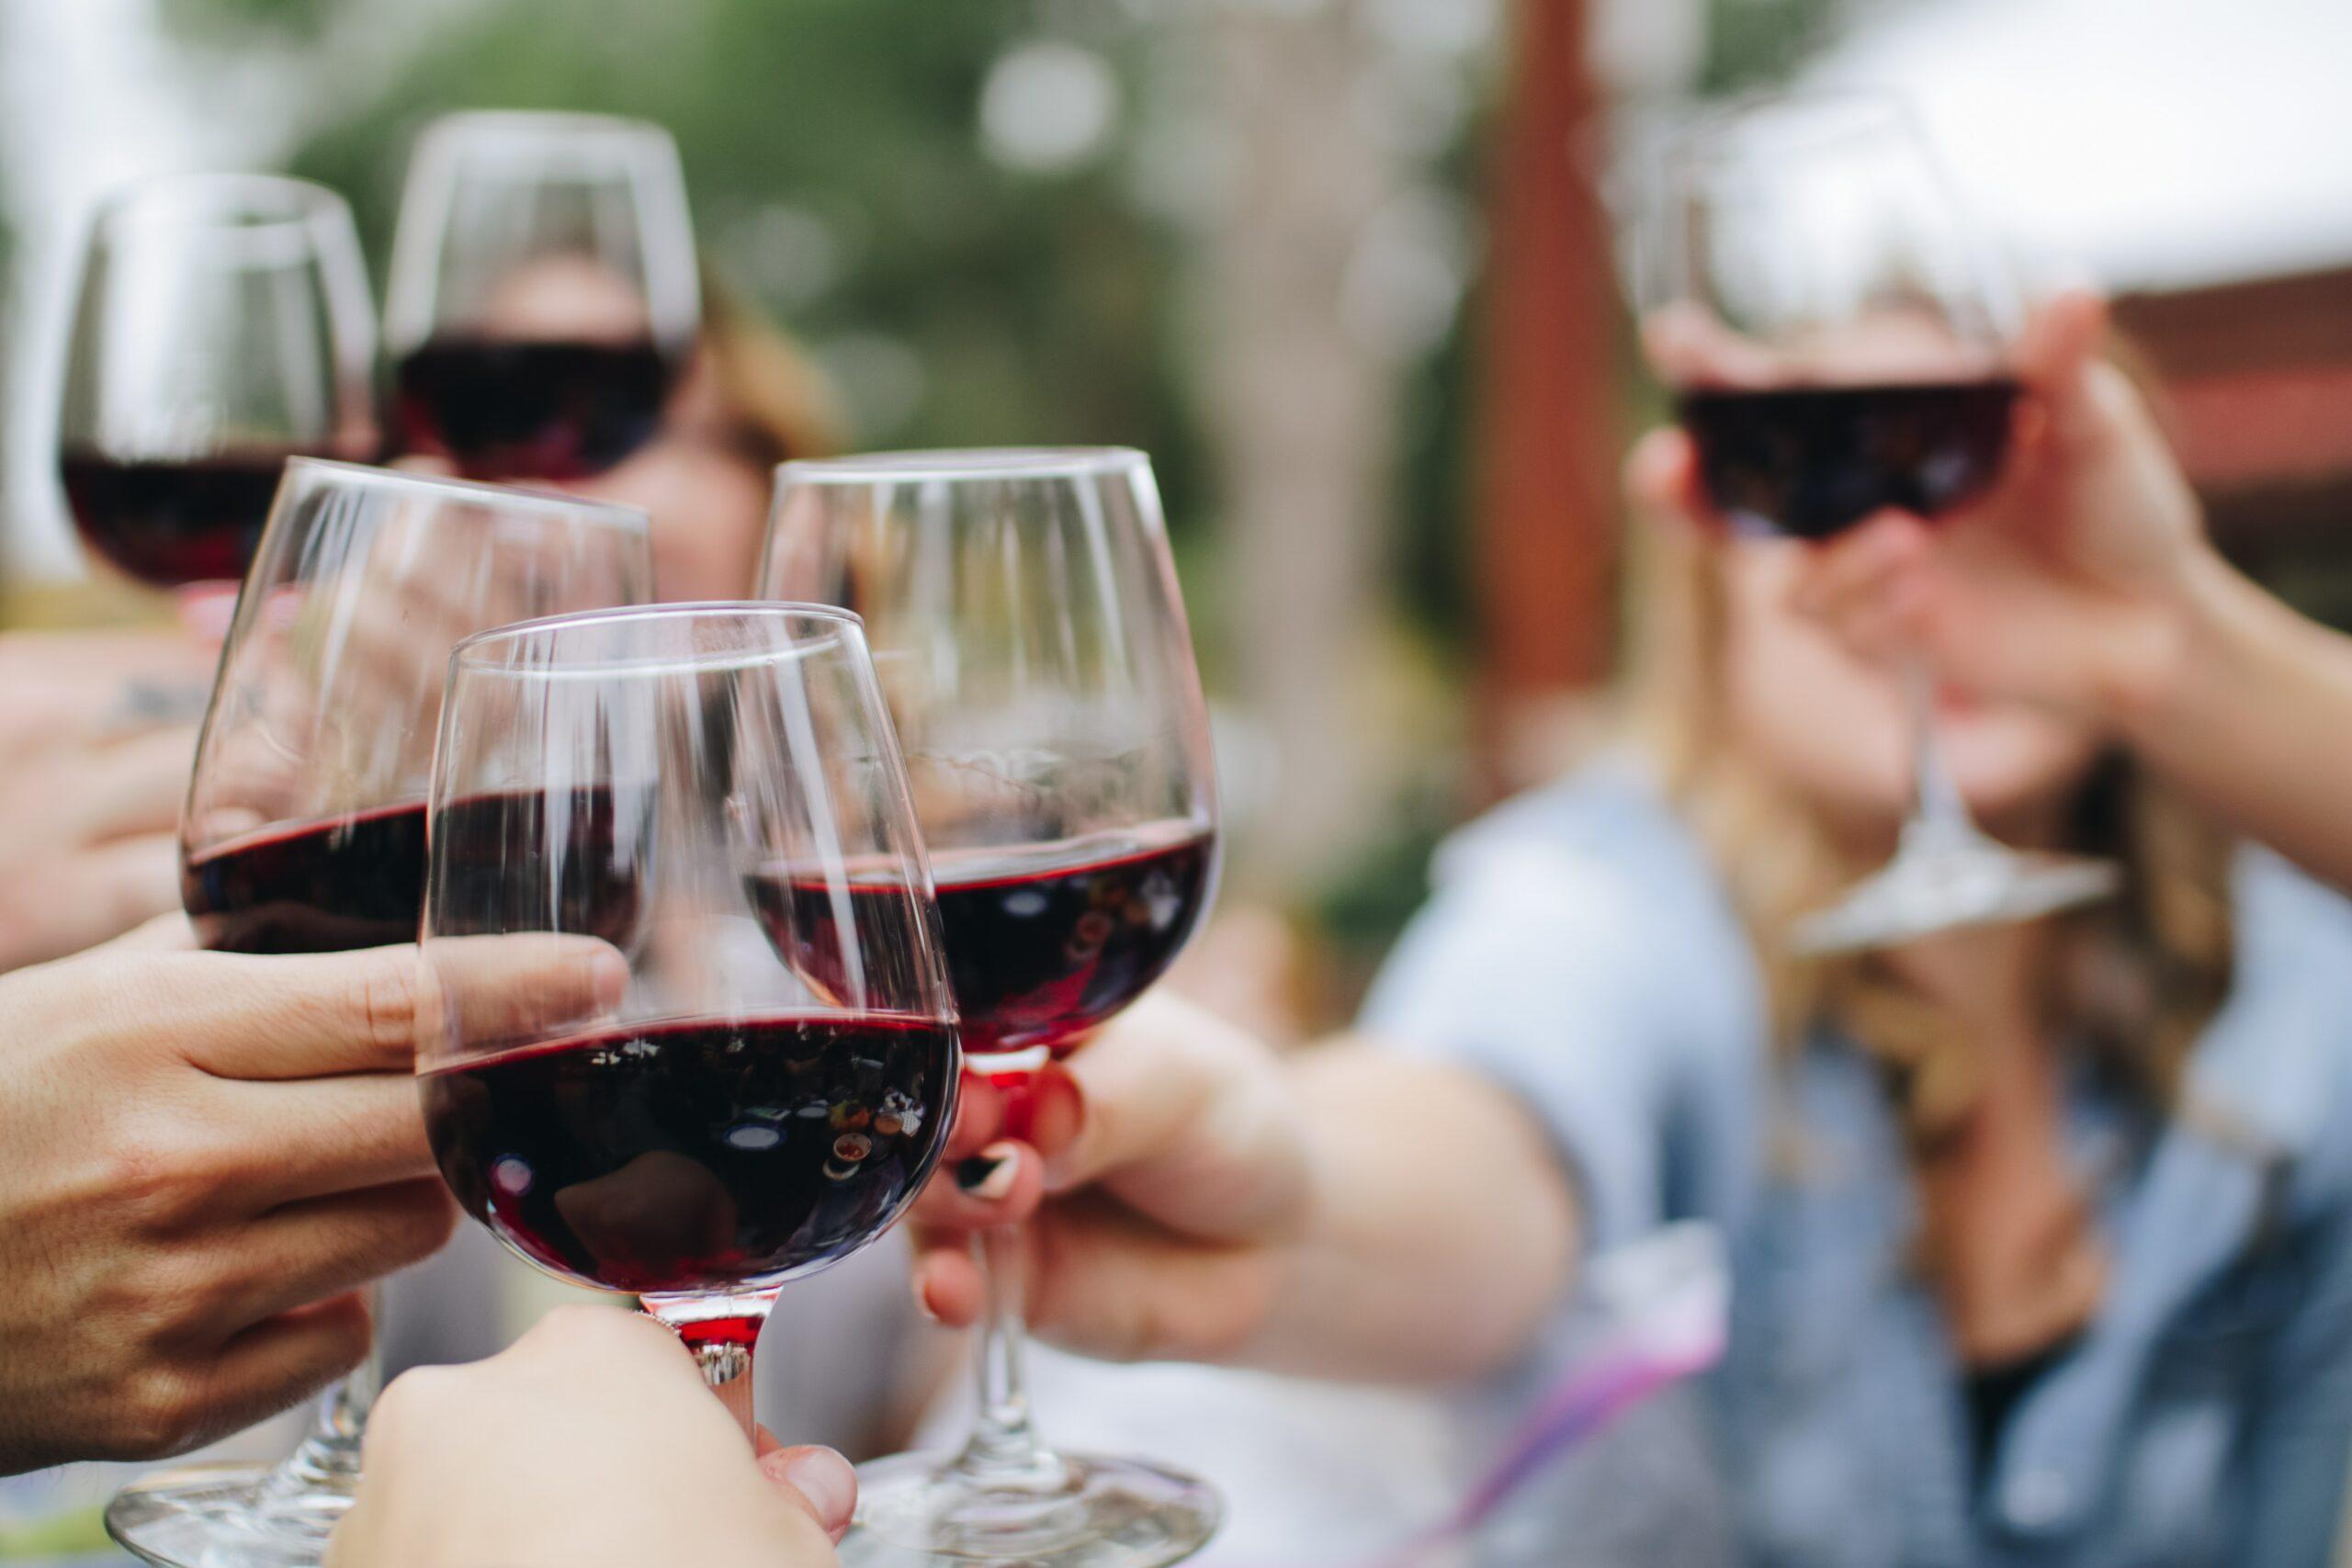 Brianne Cohen Wine Glasses Cheers